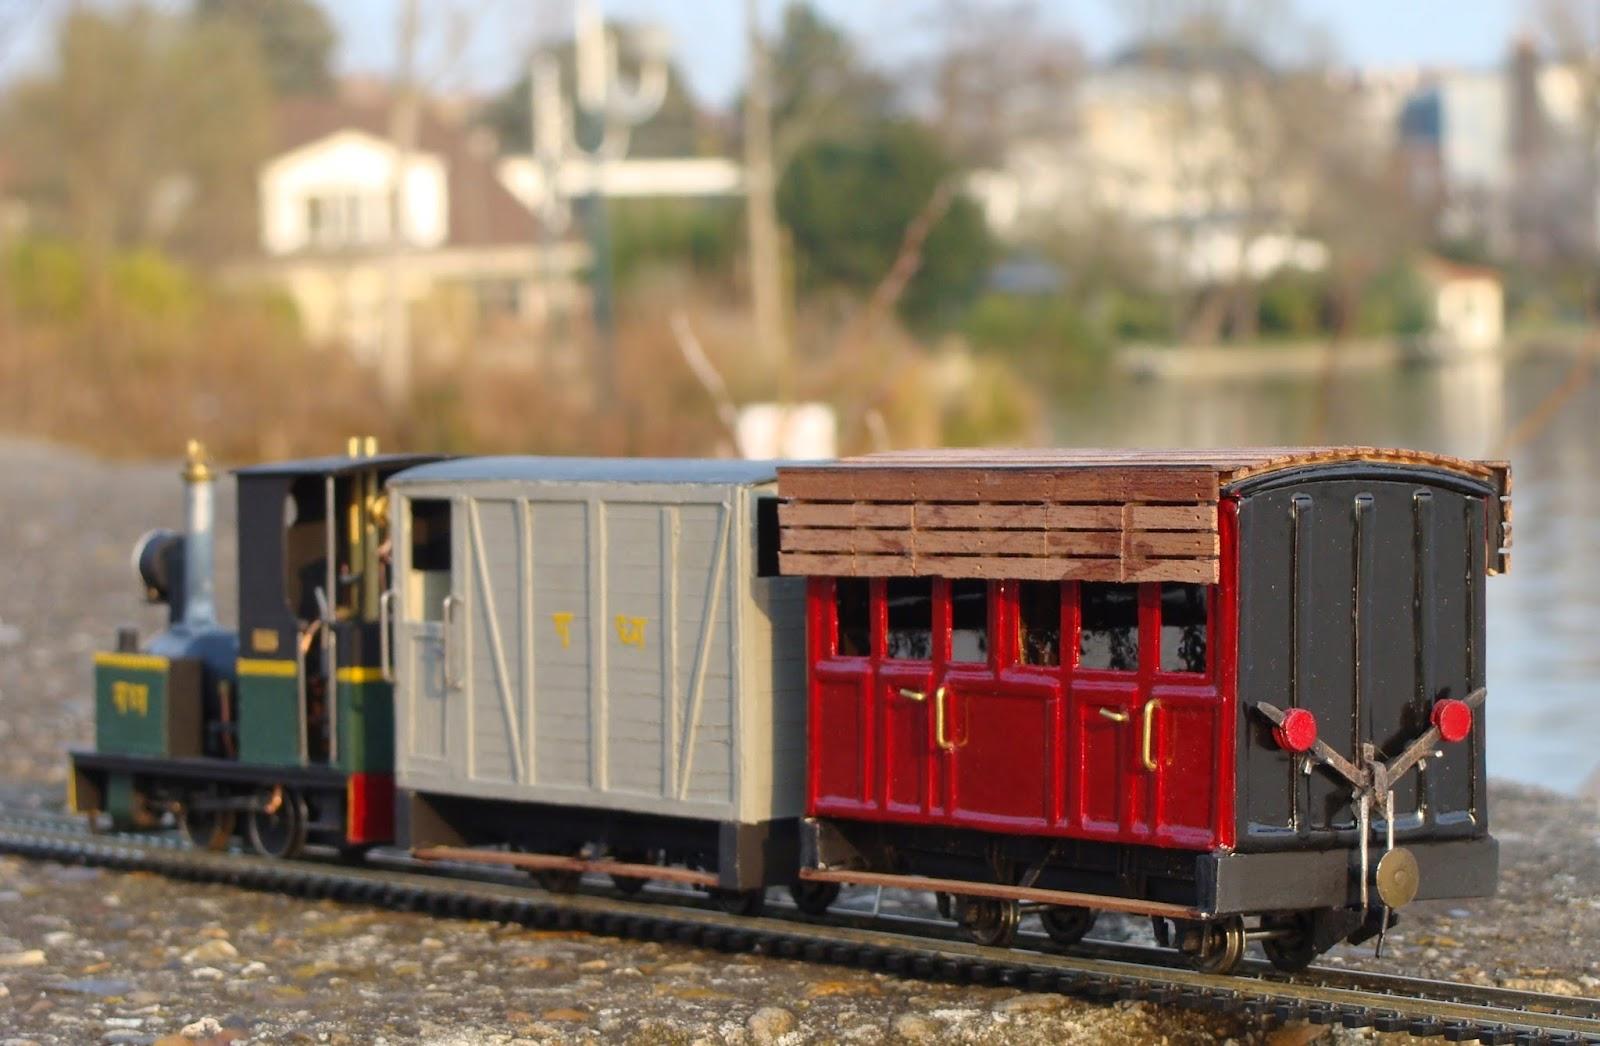 les petits trains en carton de jean baptiste des wagons du glyn valley tr s exotiques. Black Bedroom Furniture Sets. Home Design Ideas